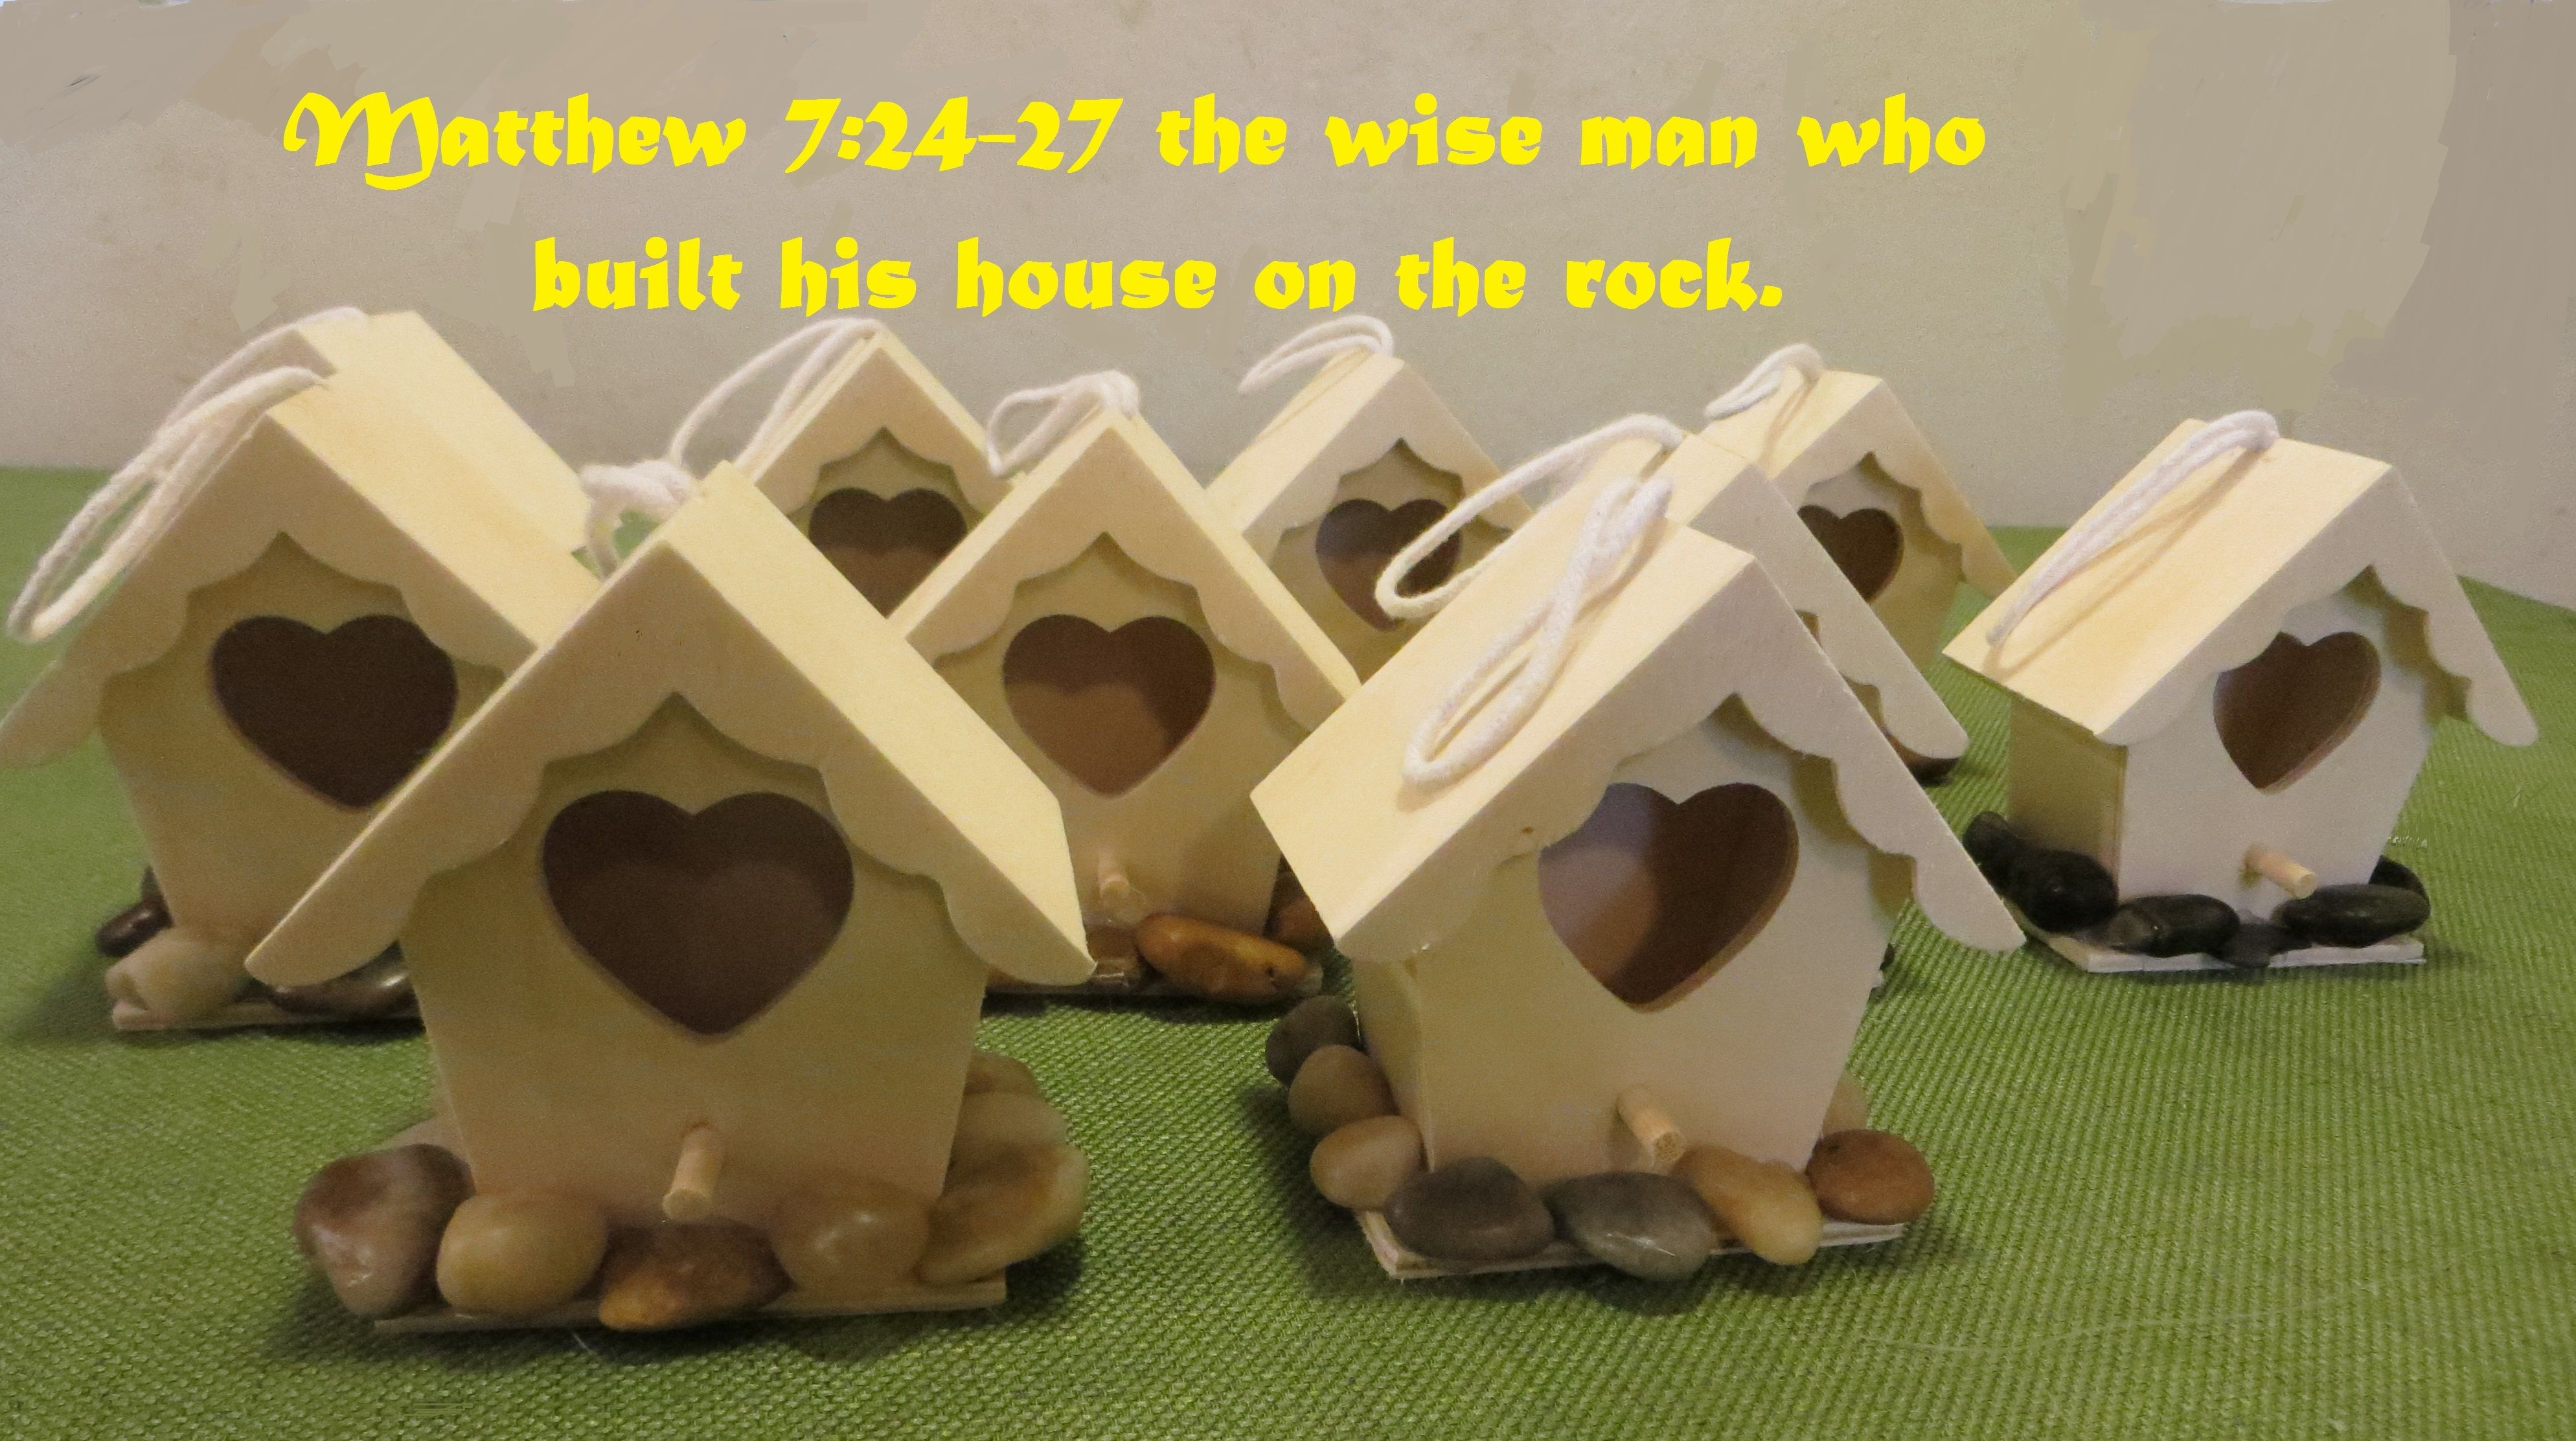 Wise man built his house upon the rock sermon - The Wise Man Built His House Upon The Rock Build Your House Upon The Rock Painted Rock Sunday School Craft Activity Buildyourhouseonrockwordofg